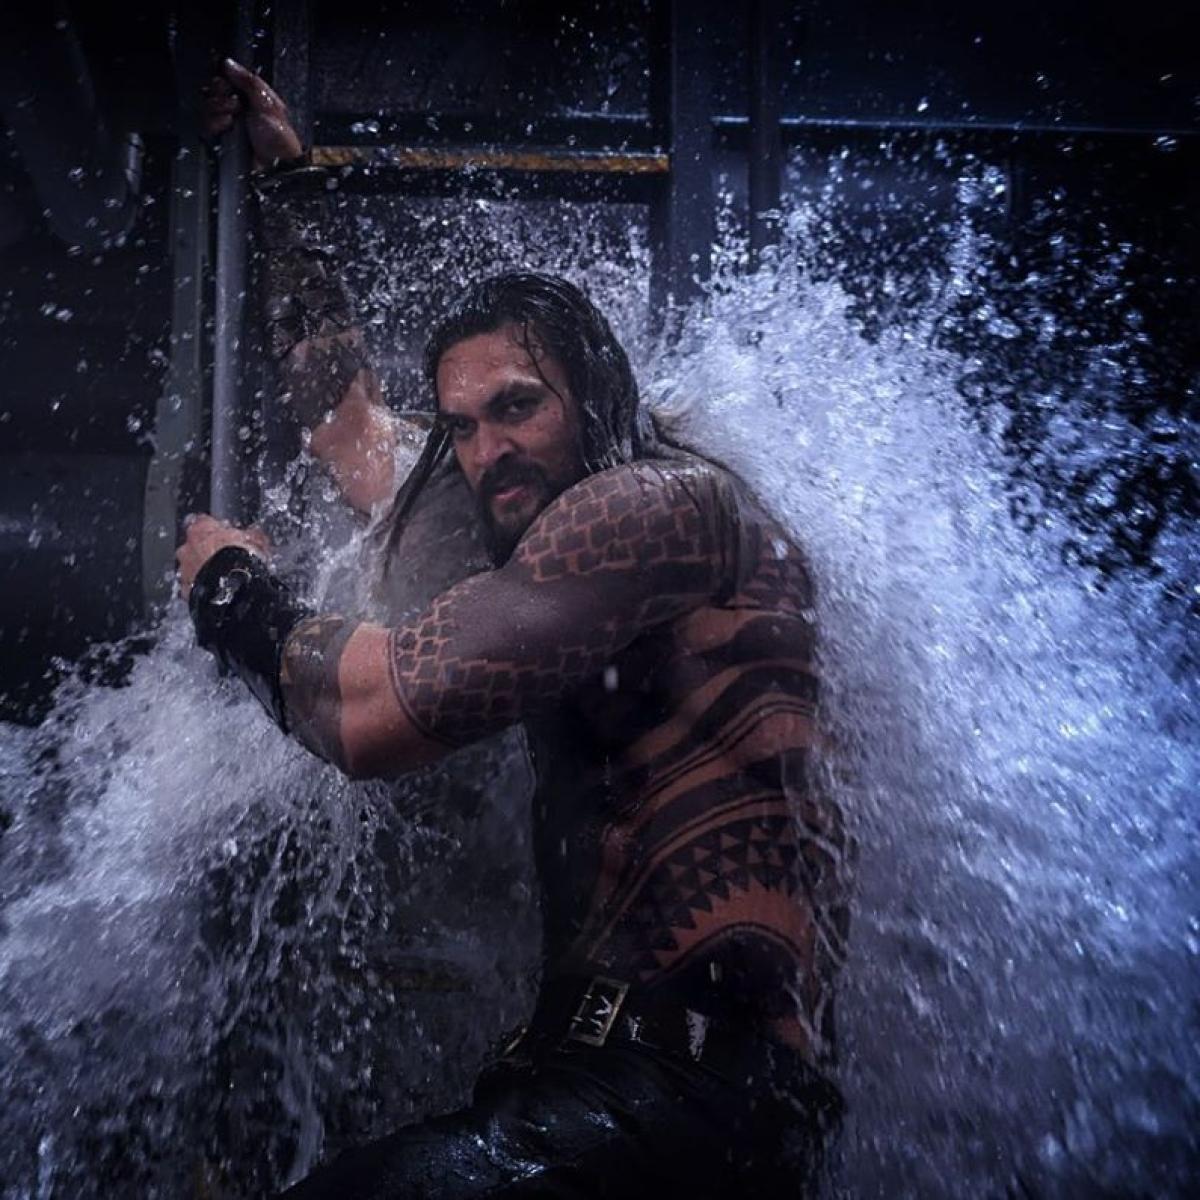 ''Aquaman' sequel starring Jason Momoa will include elements of horror', reveals director James Wan